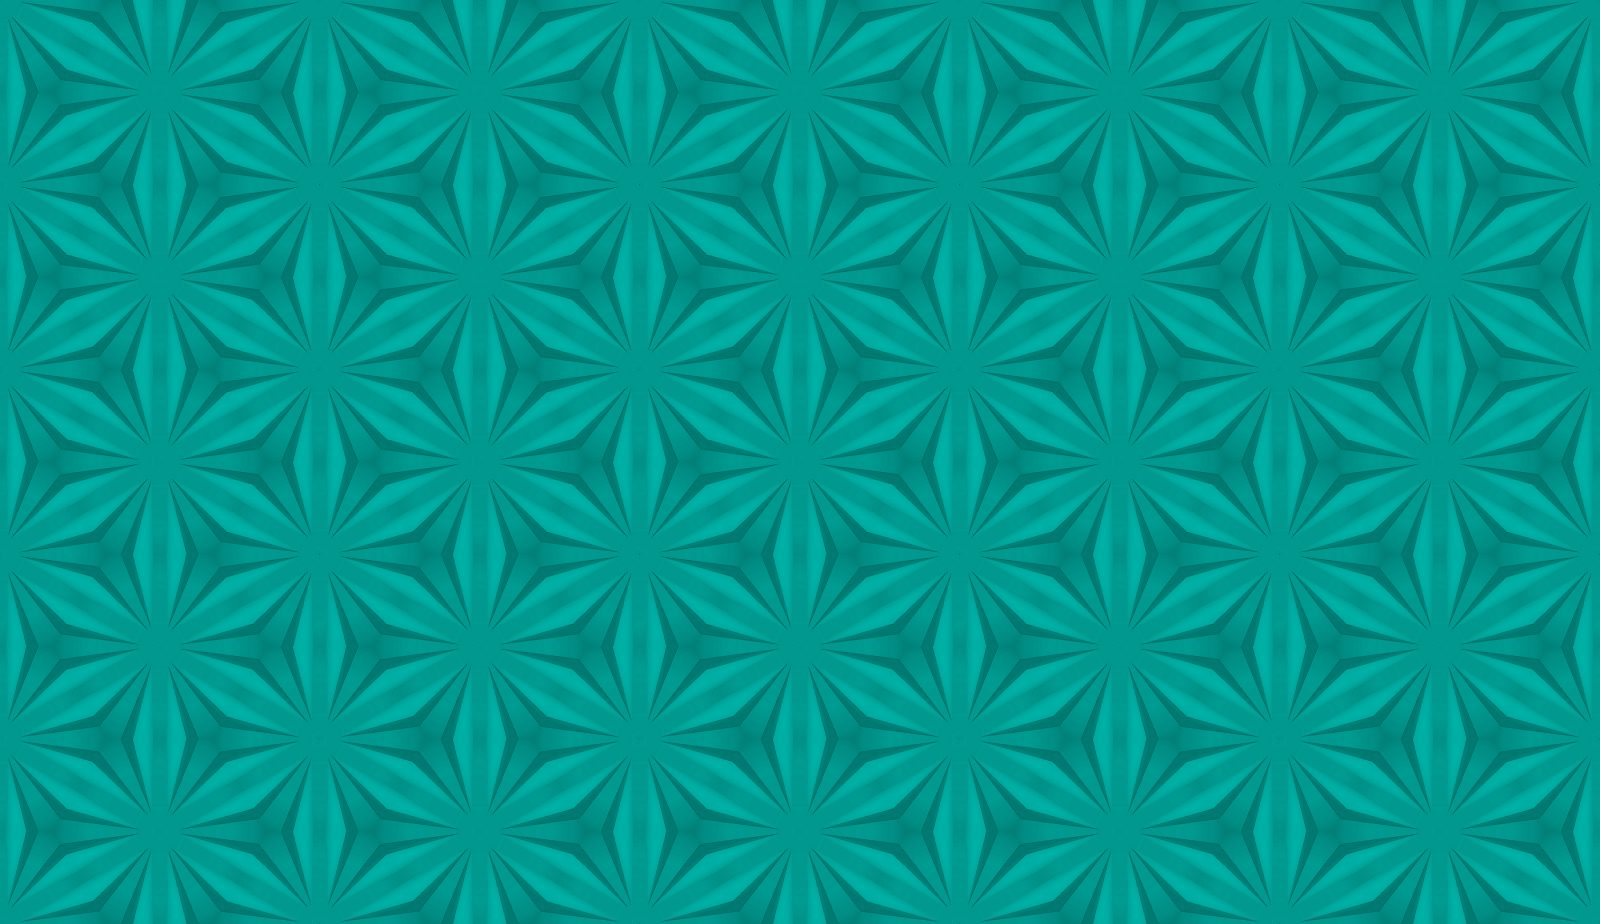 Trianglular Gradient Soft Seamless Pattern